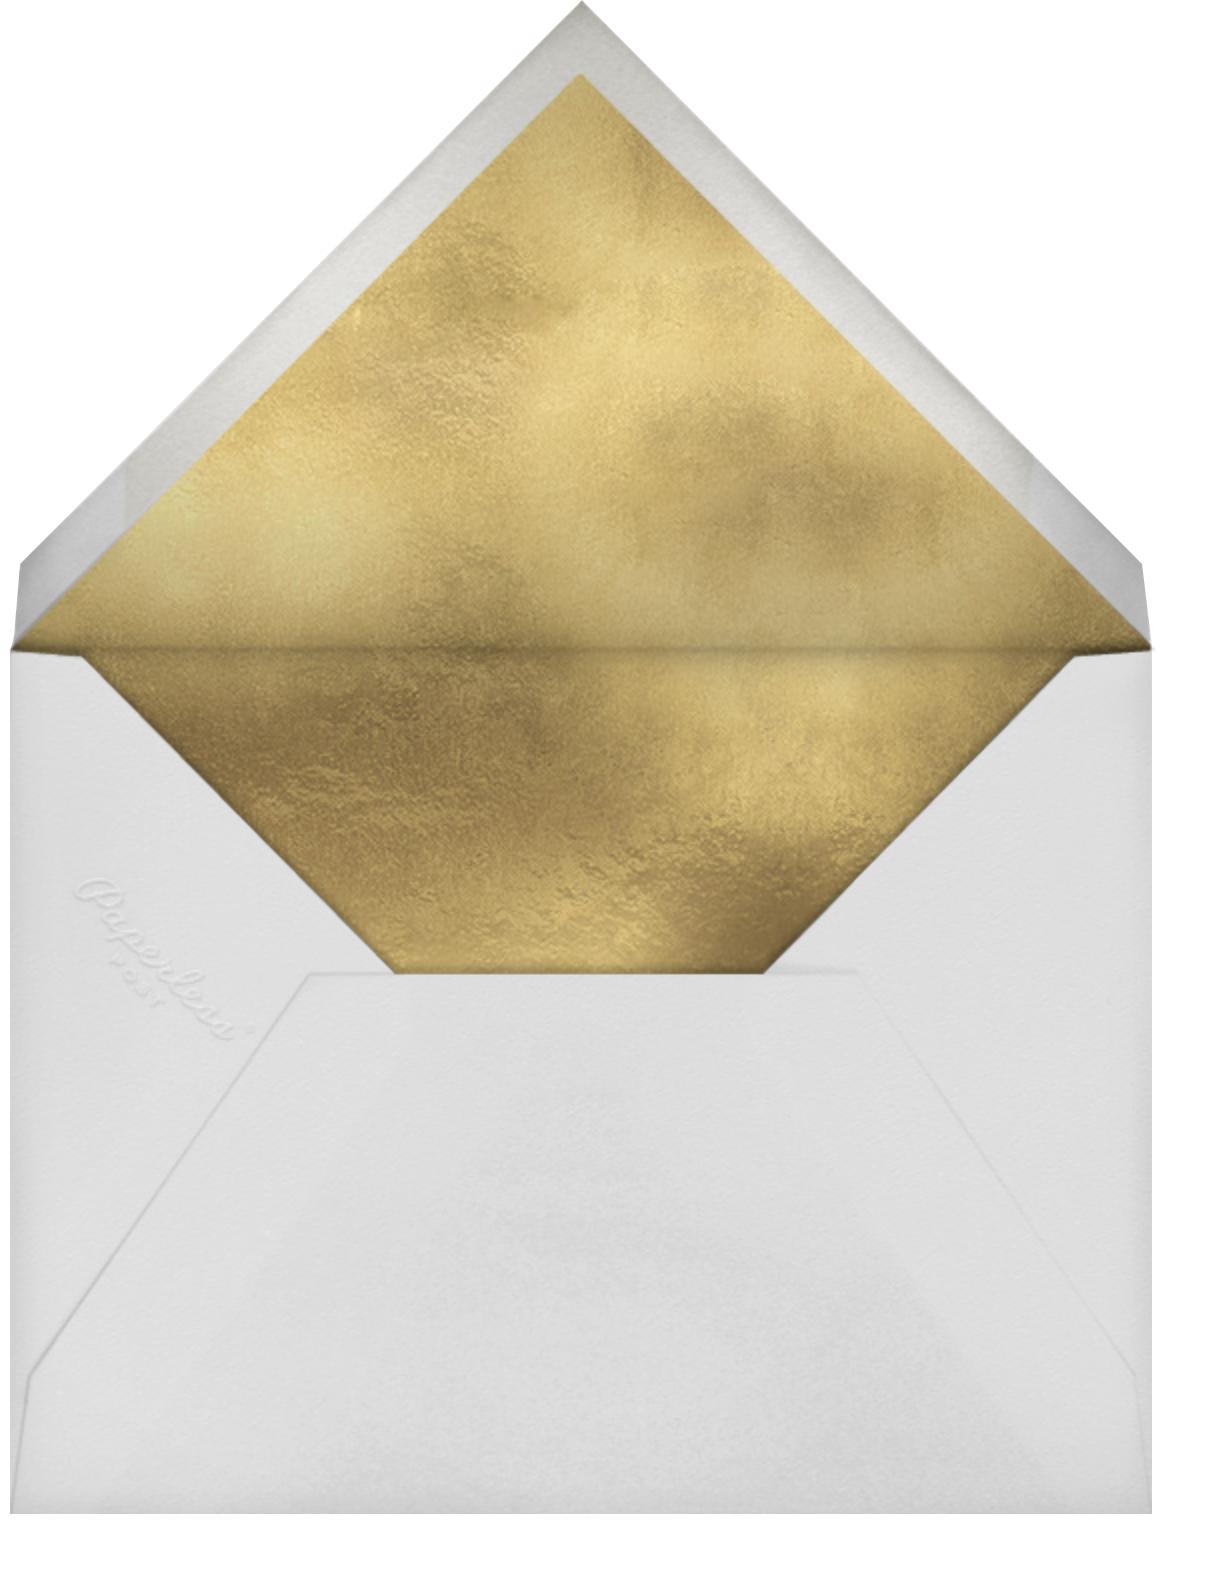 Embossed Daisies - Mint - kate spade new york - Baby shower - envelope back